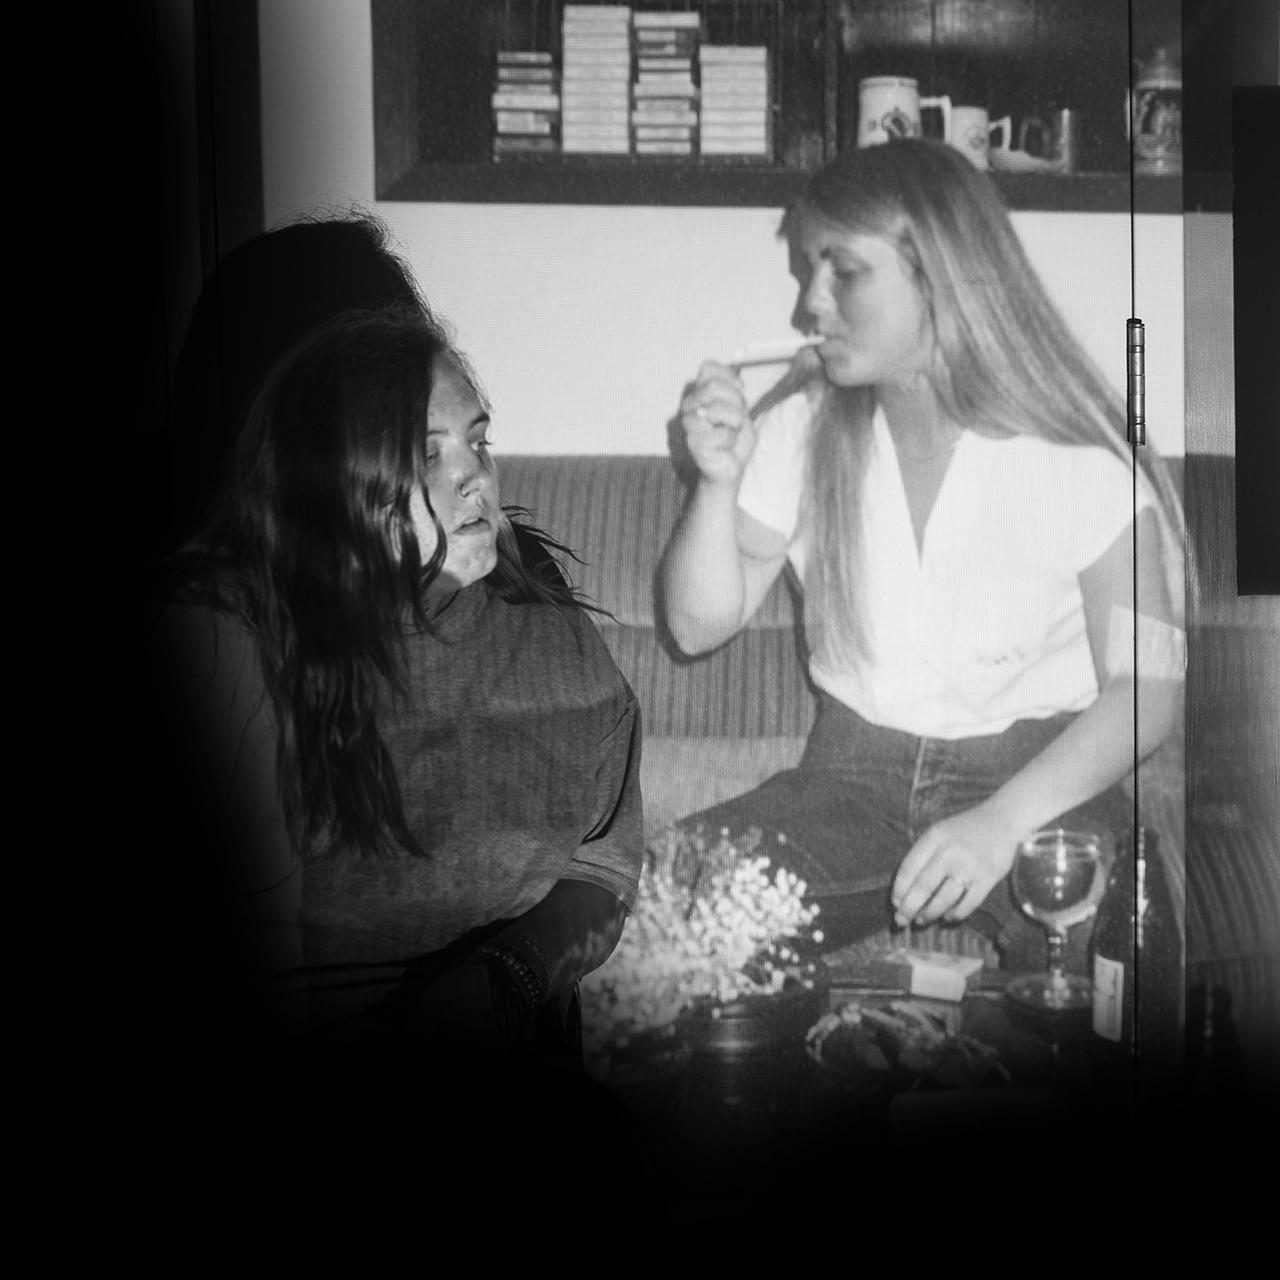 Alyssa Willey, Mom and I at 20